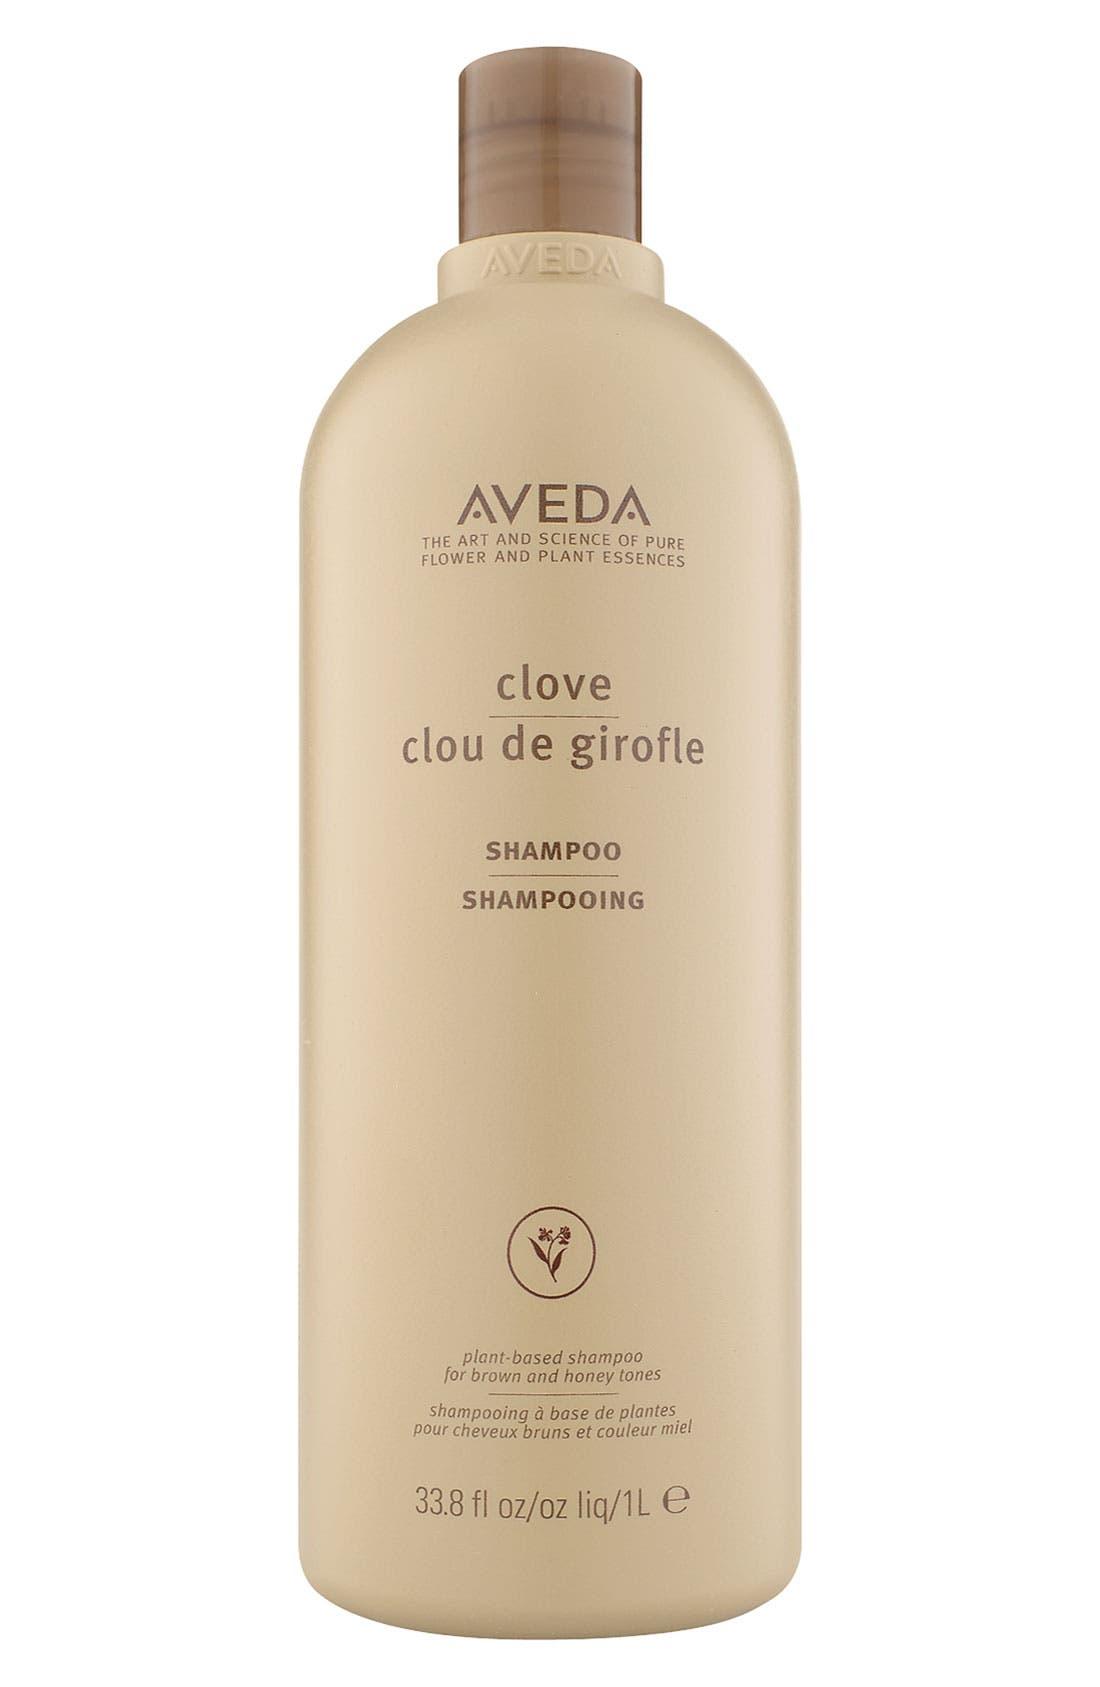 Aveda Clove Shampoo